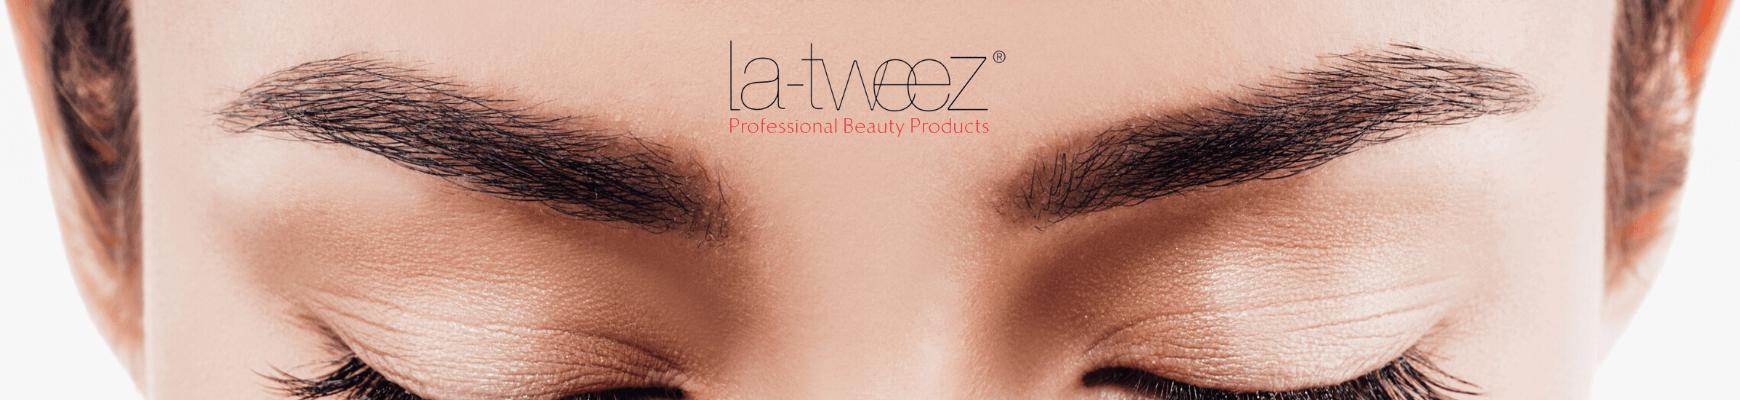 La Tweez Professional Beauty Products